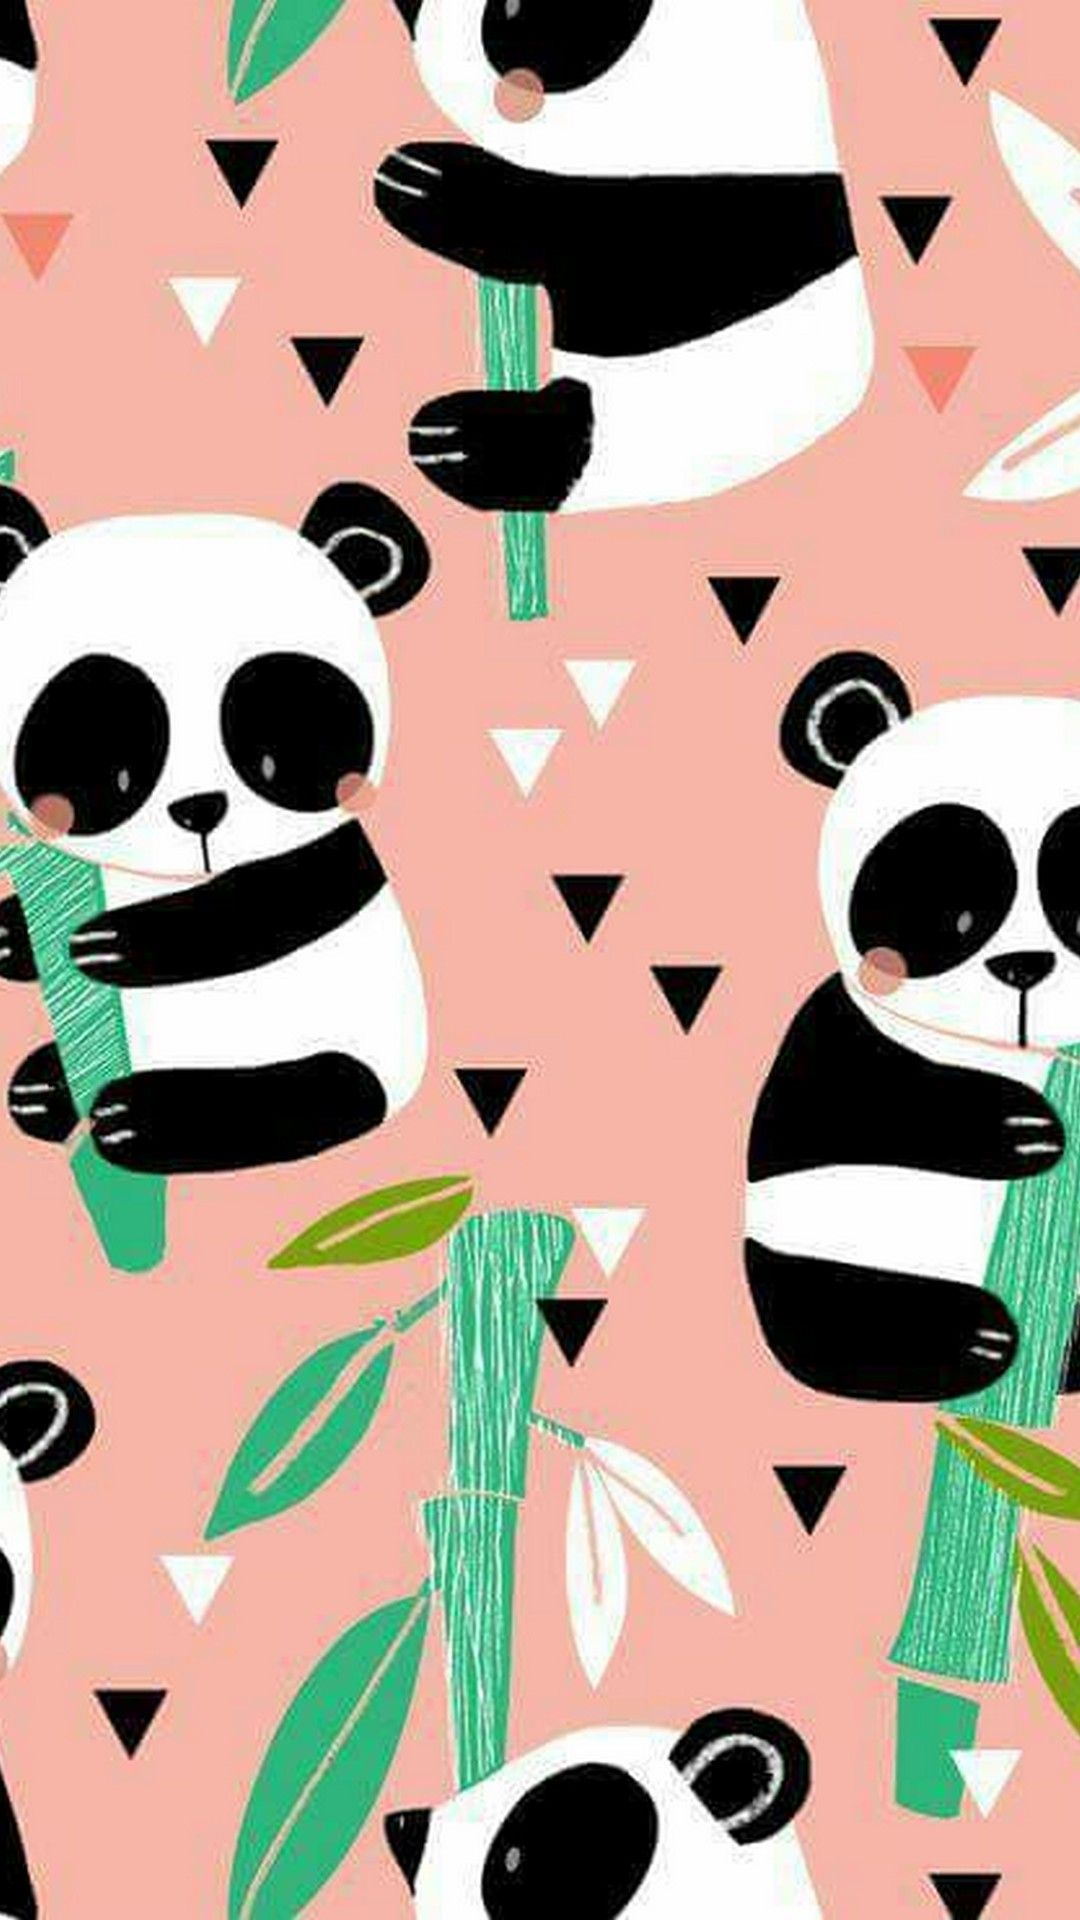 Girly Paw Patrol Photo Panda Background Panda Wallpapers Panda Bears Wallpaper